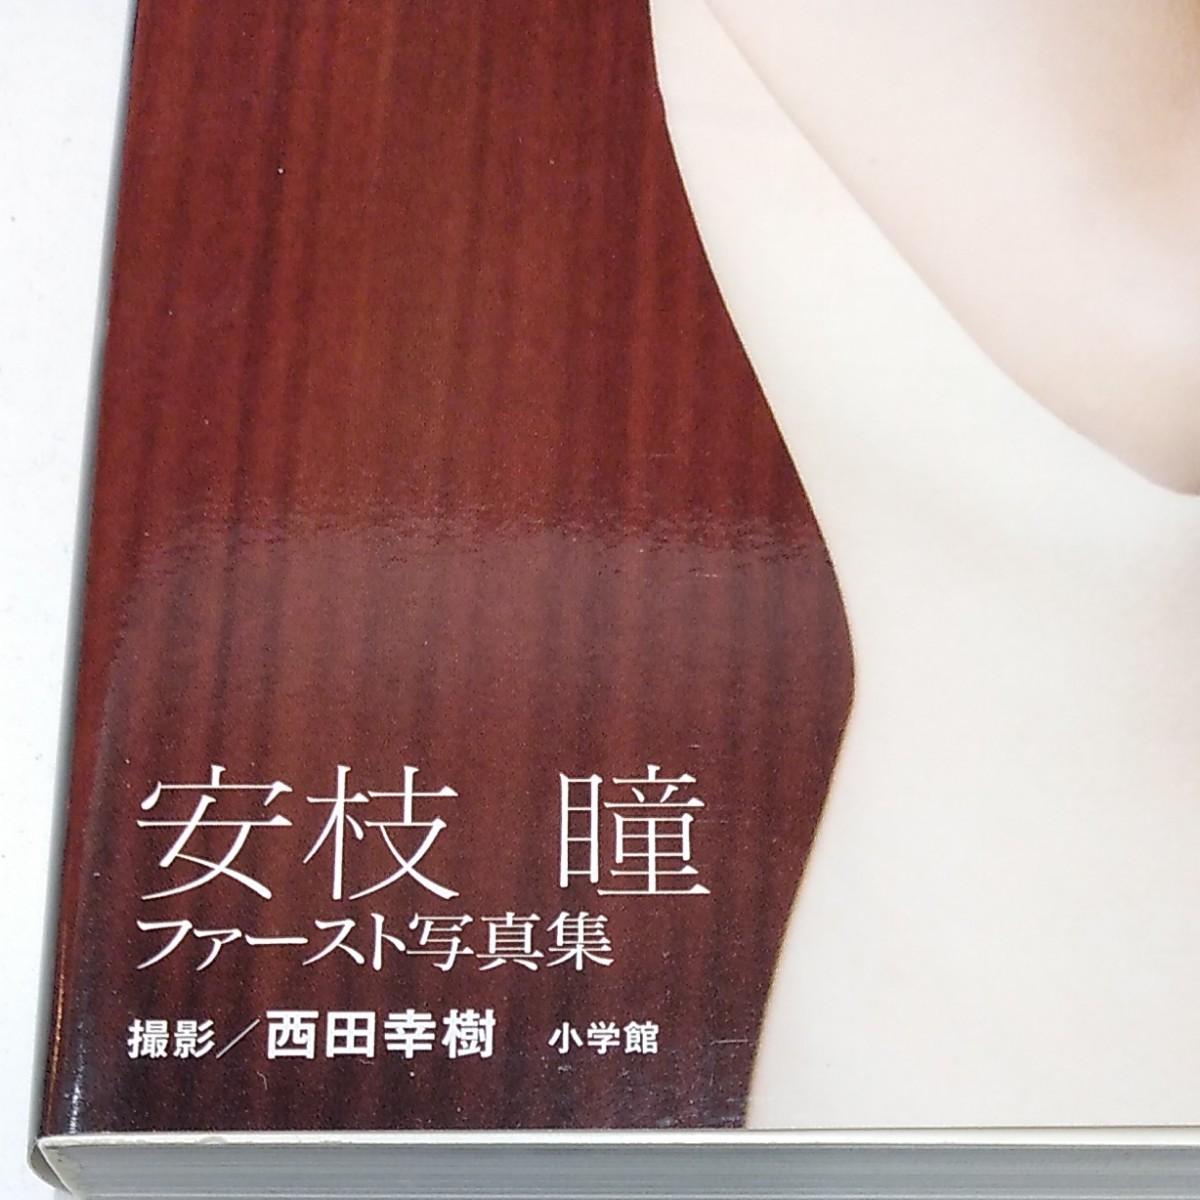 初版 安枝瞳 ファースト写真集